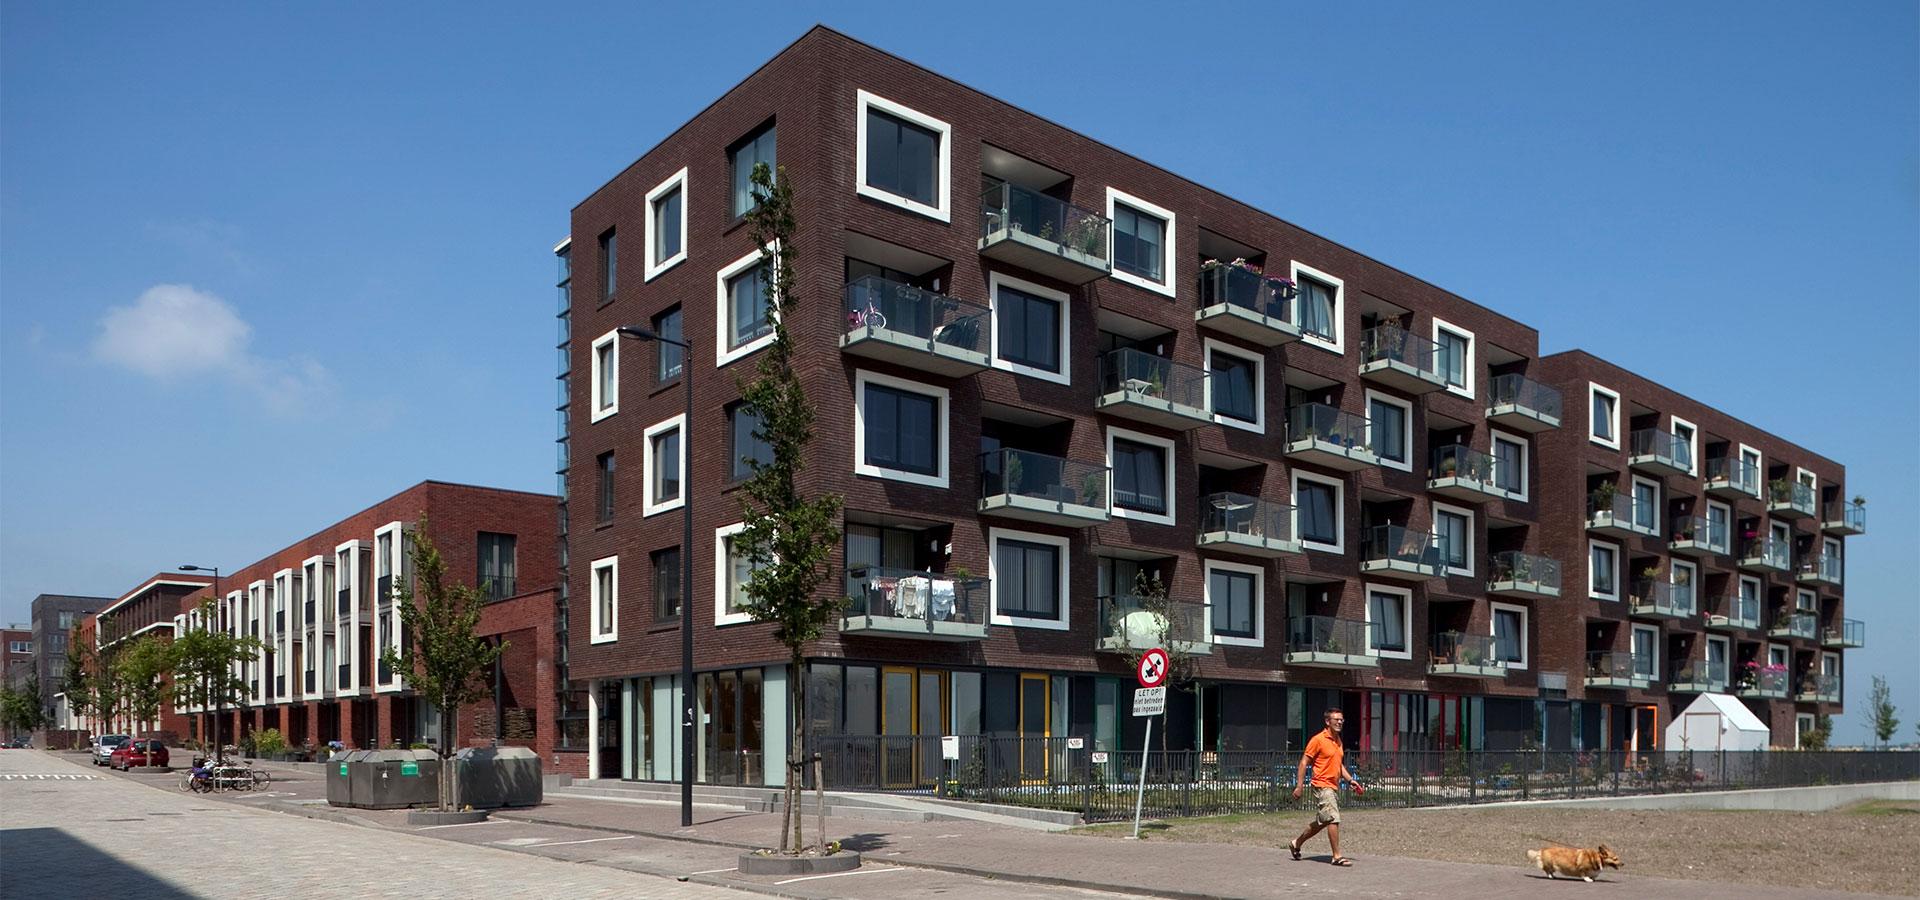 FARO architecten Blok 25 Haveneiland IJburg Amsterdam 09